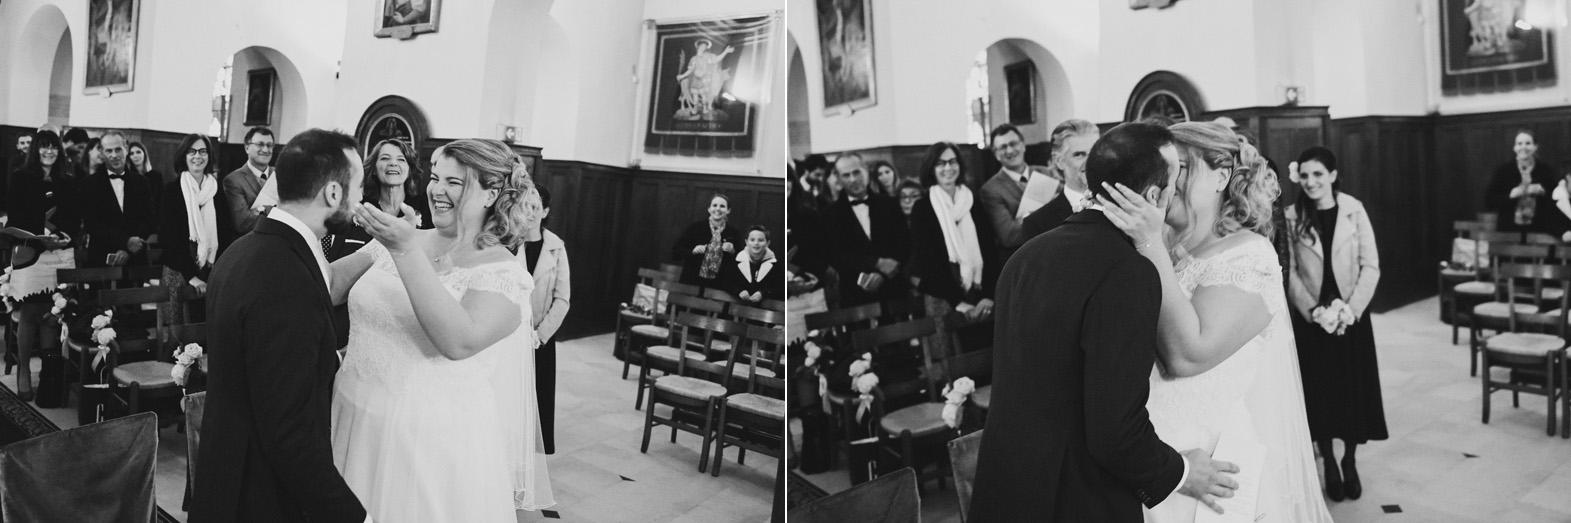 mariage_CK_pavillon Henri IV_yvelines_78_photographie_clemence_dubois MEP 7